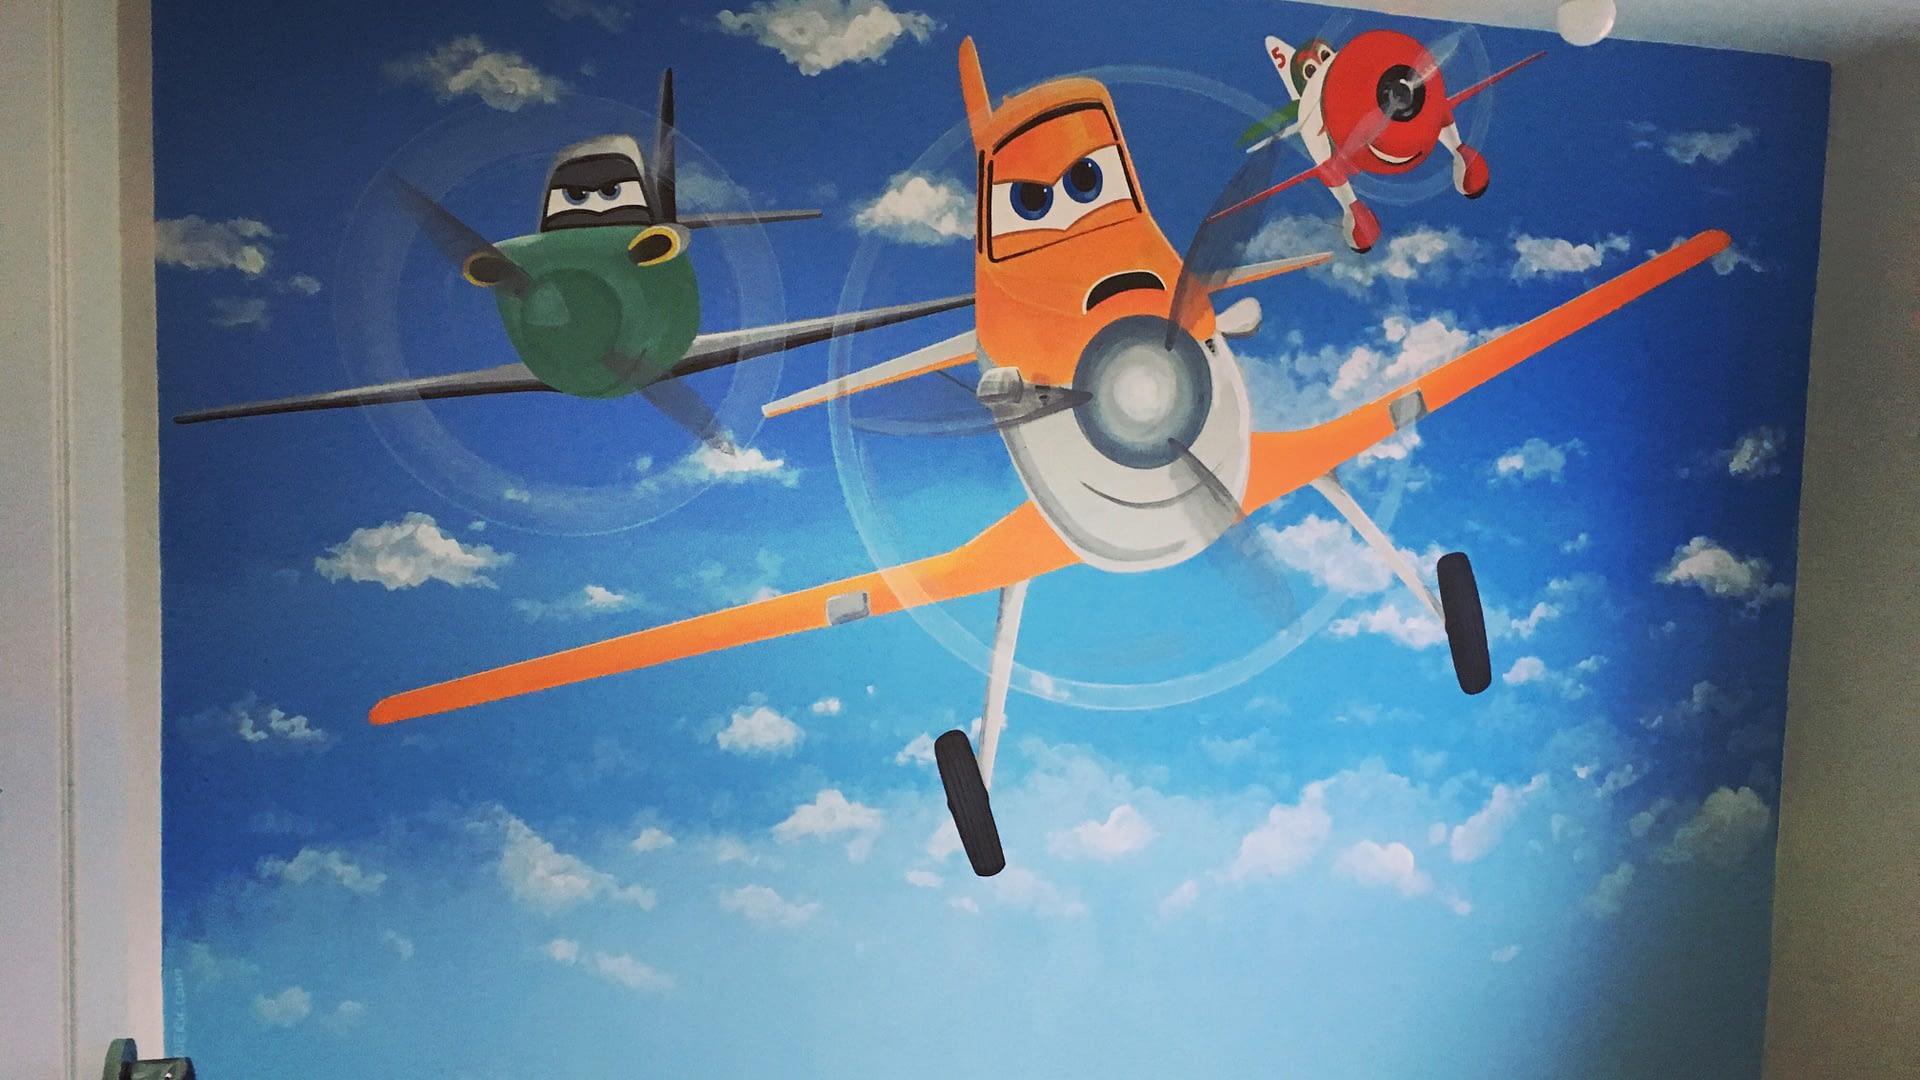 Pixar Planes